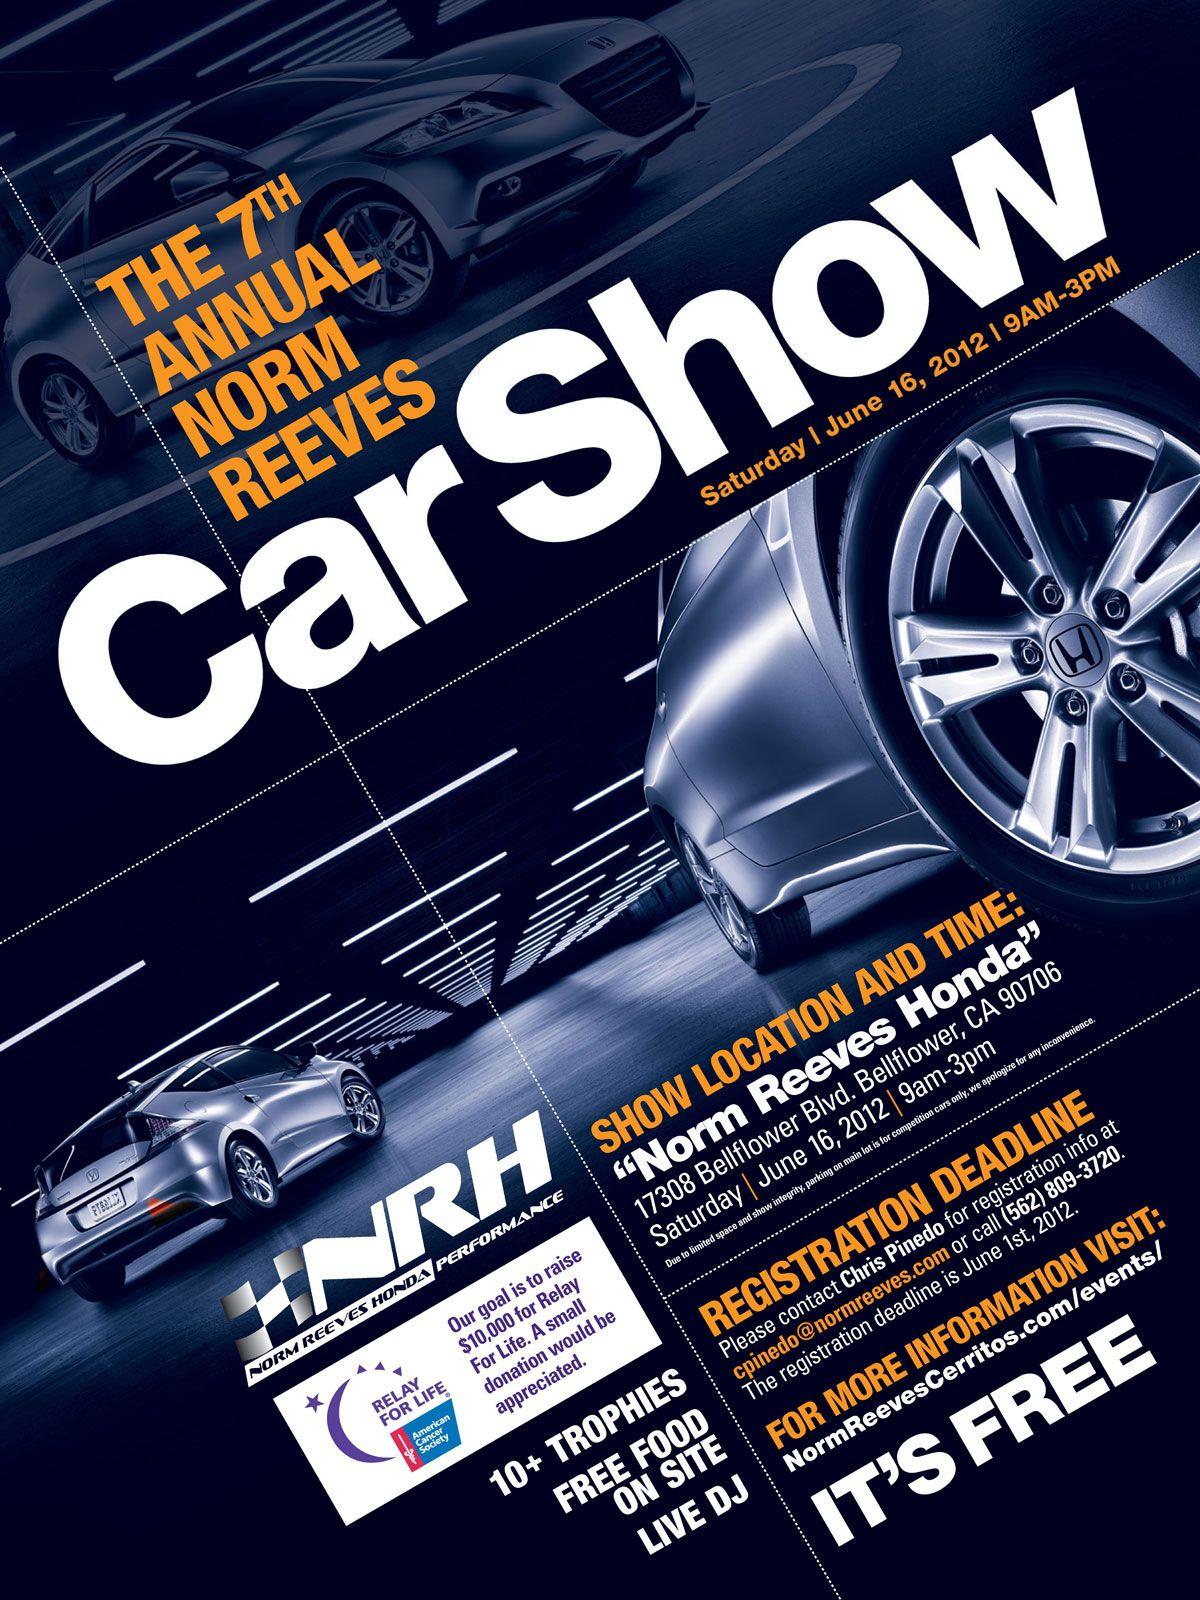 car show flyer Pesquisa Google Artes em geral – Car Flyer